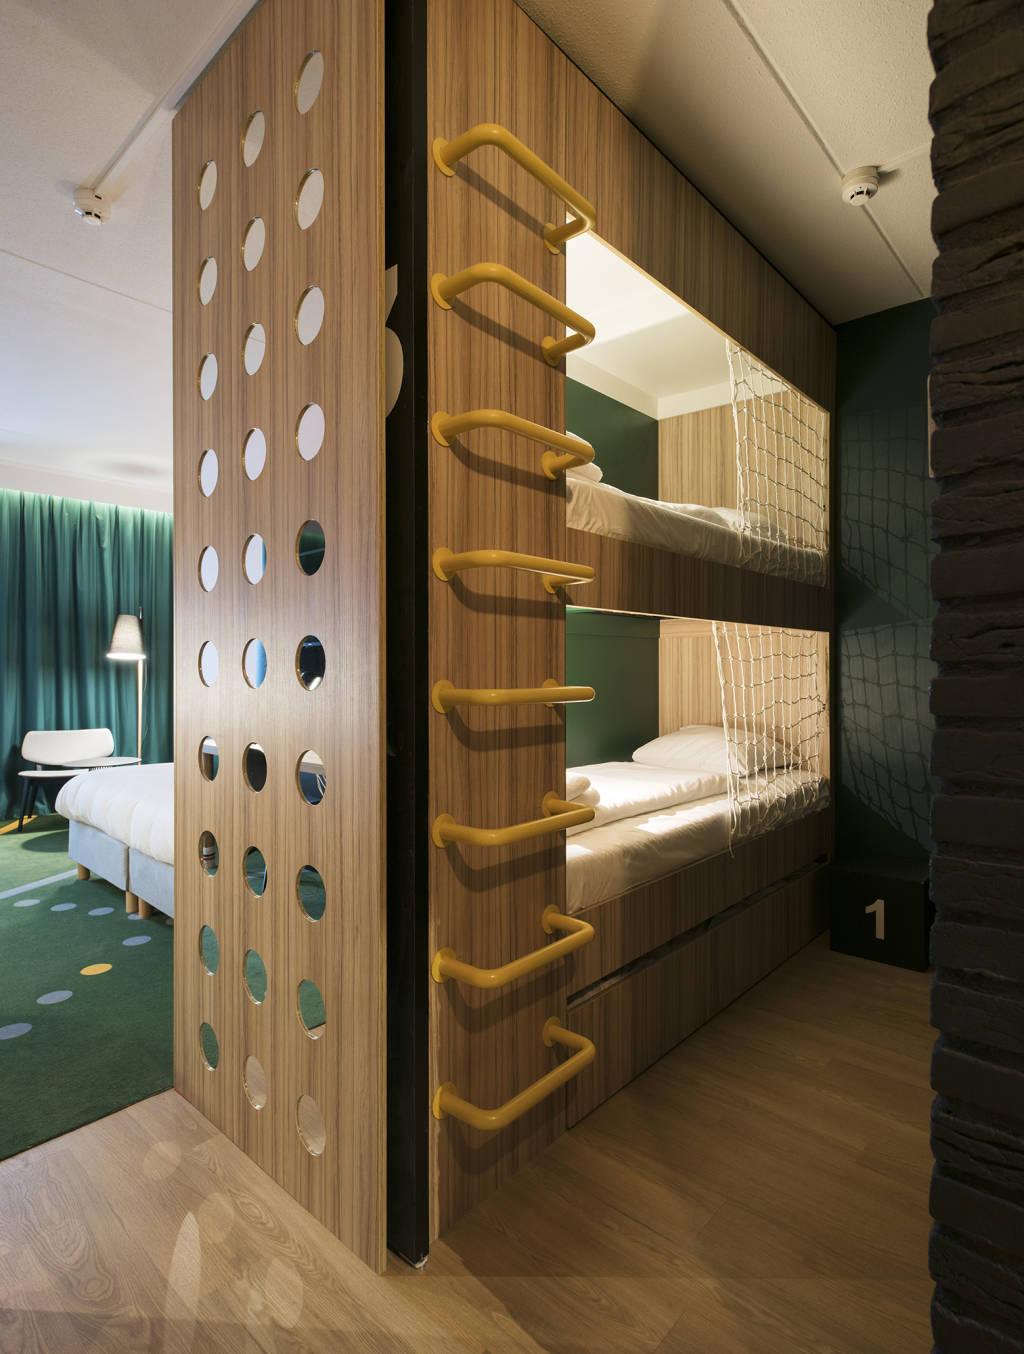 Creneau Interior Design Agency Dubai Middle East HUP hotel